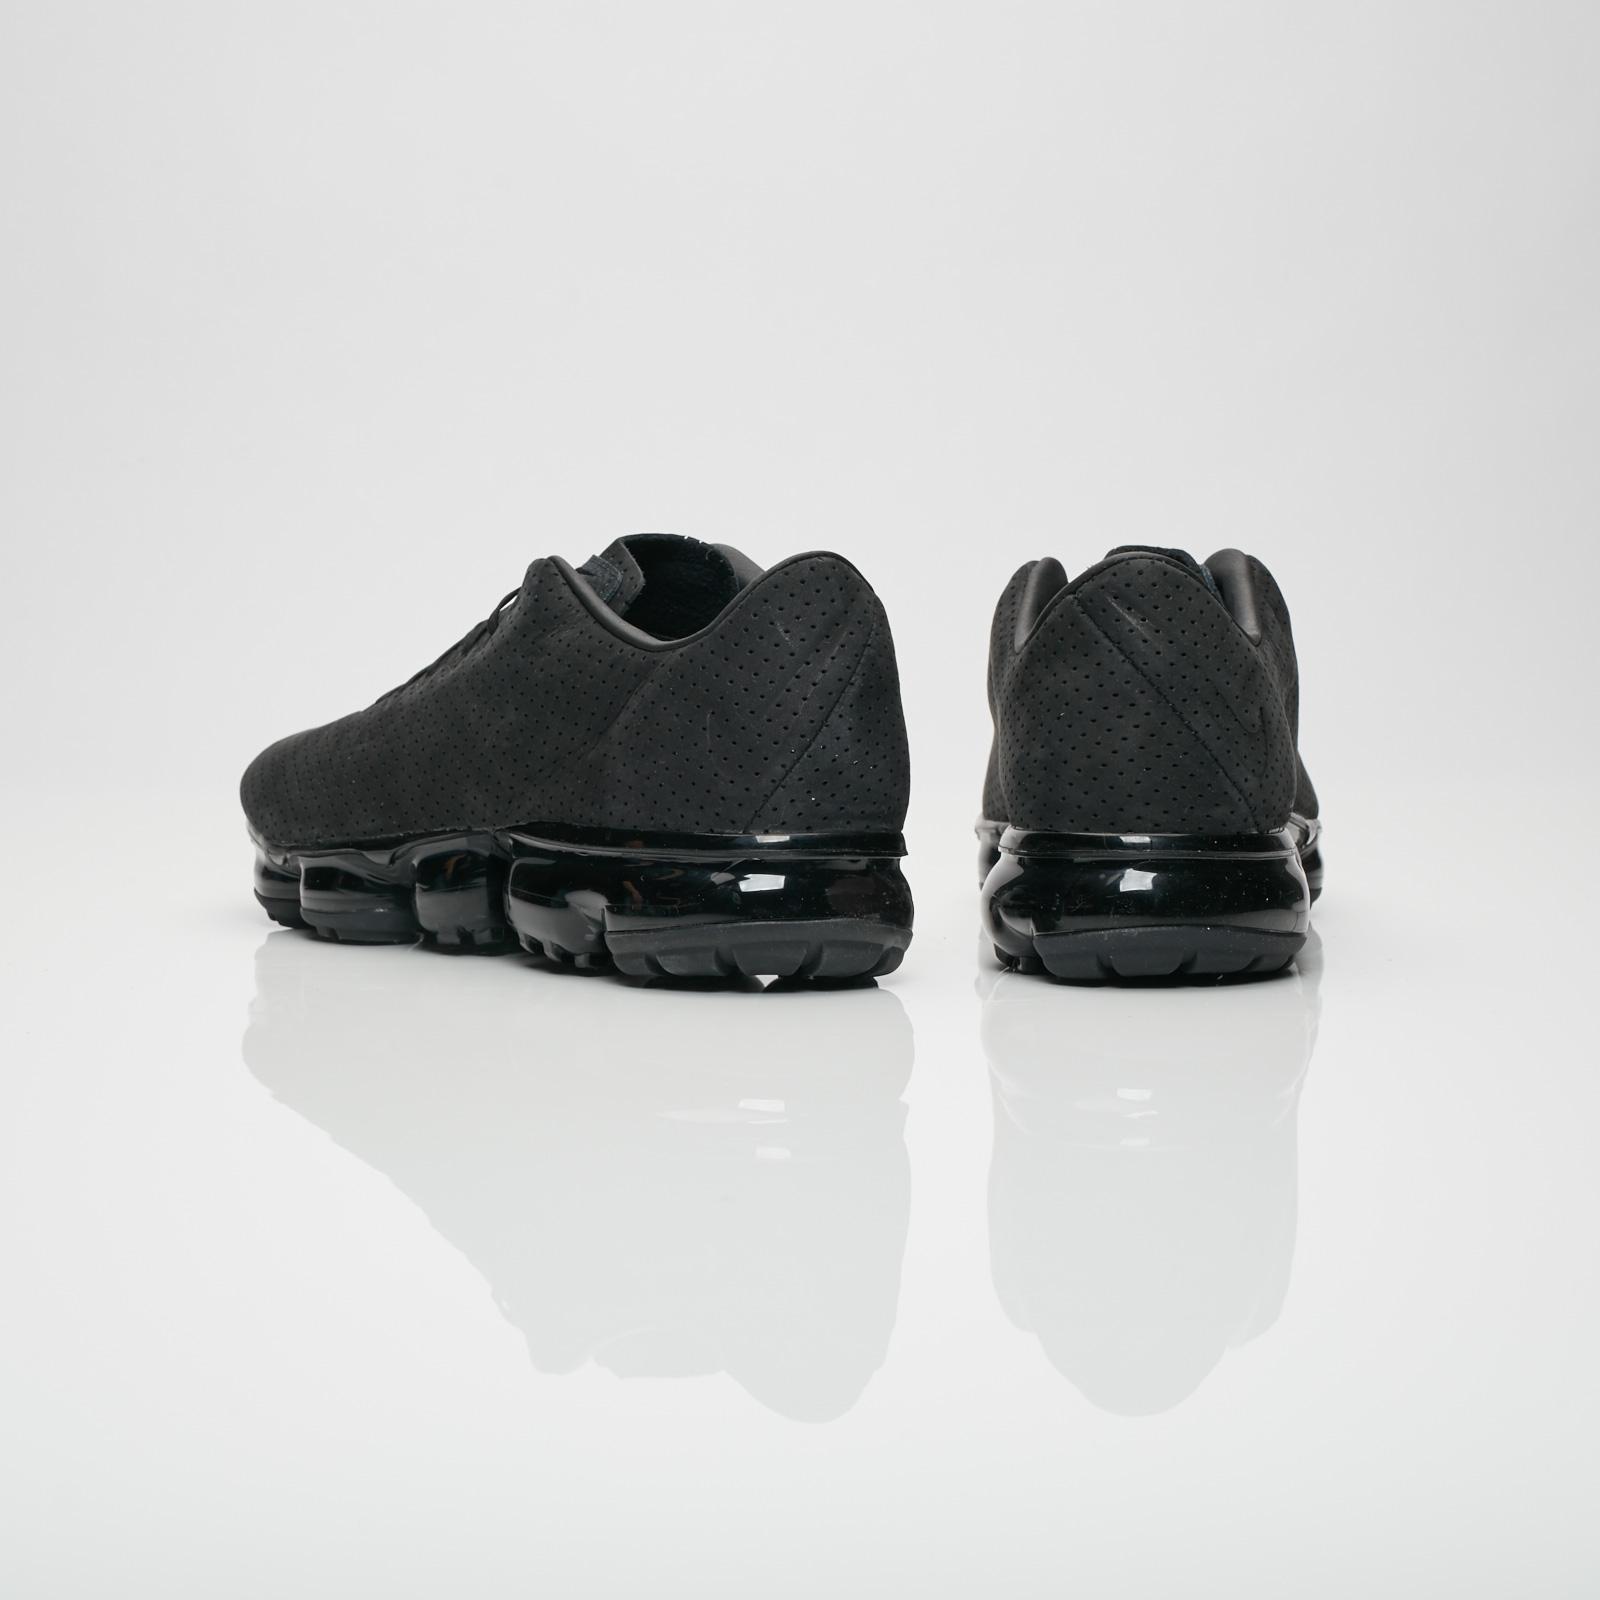 Nike Air Vapormax LTR - Aj8287-001